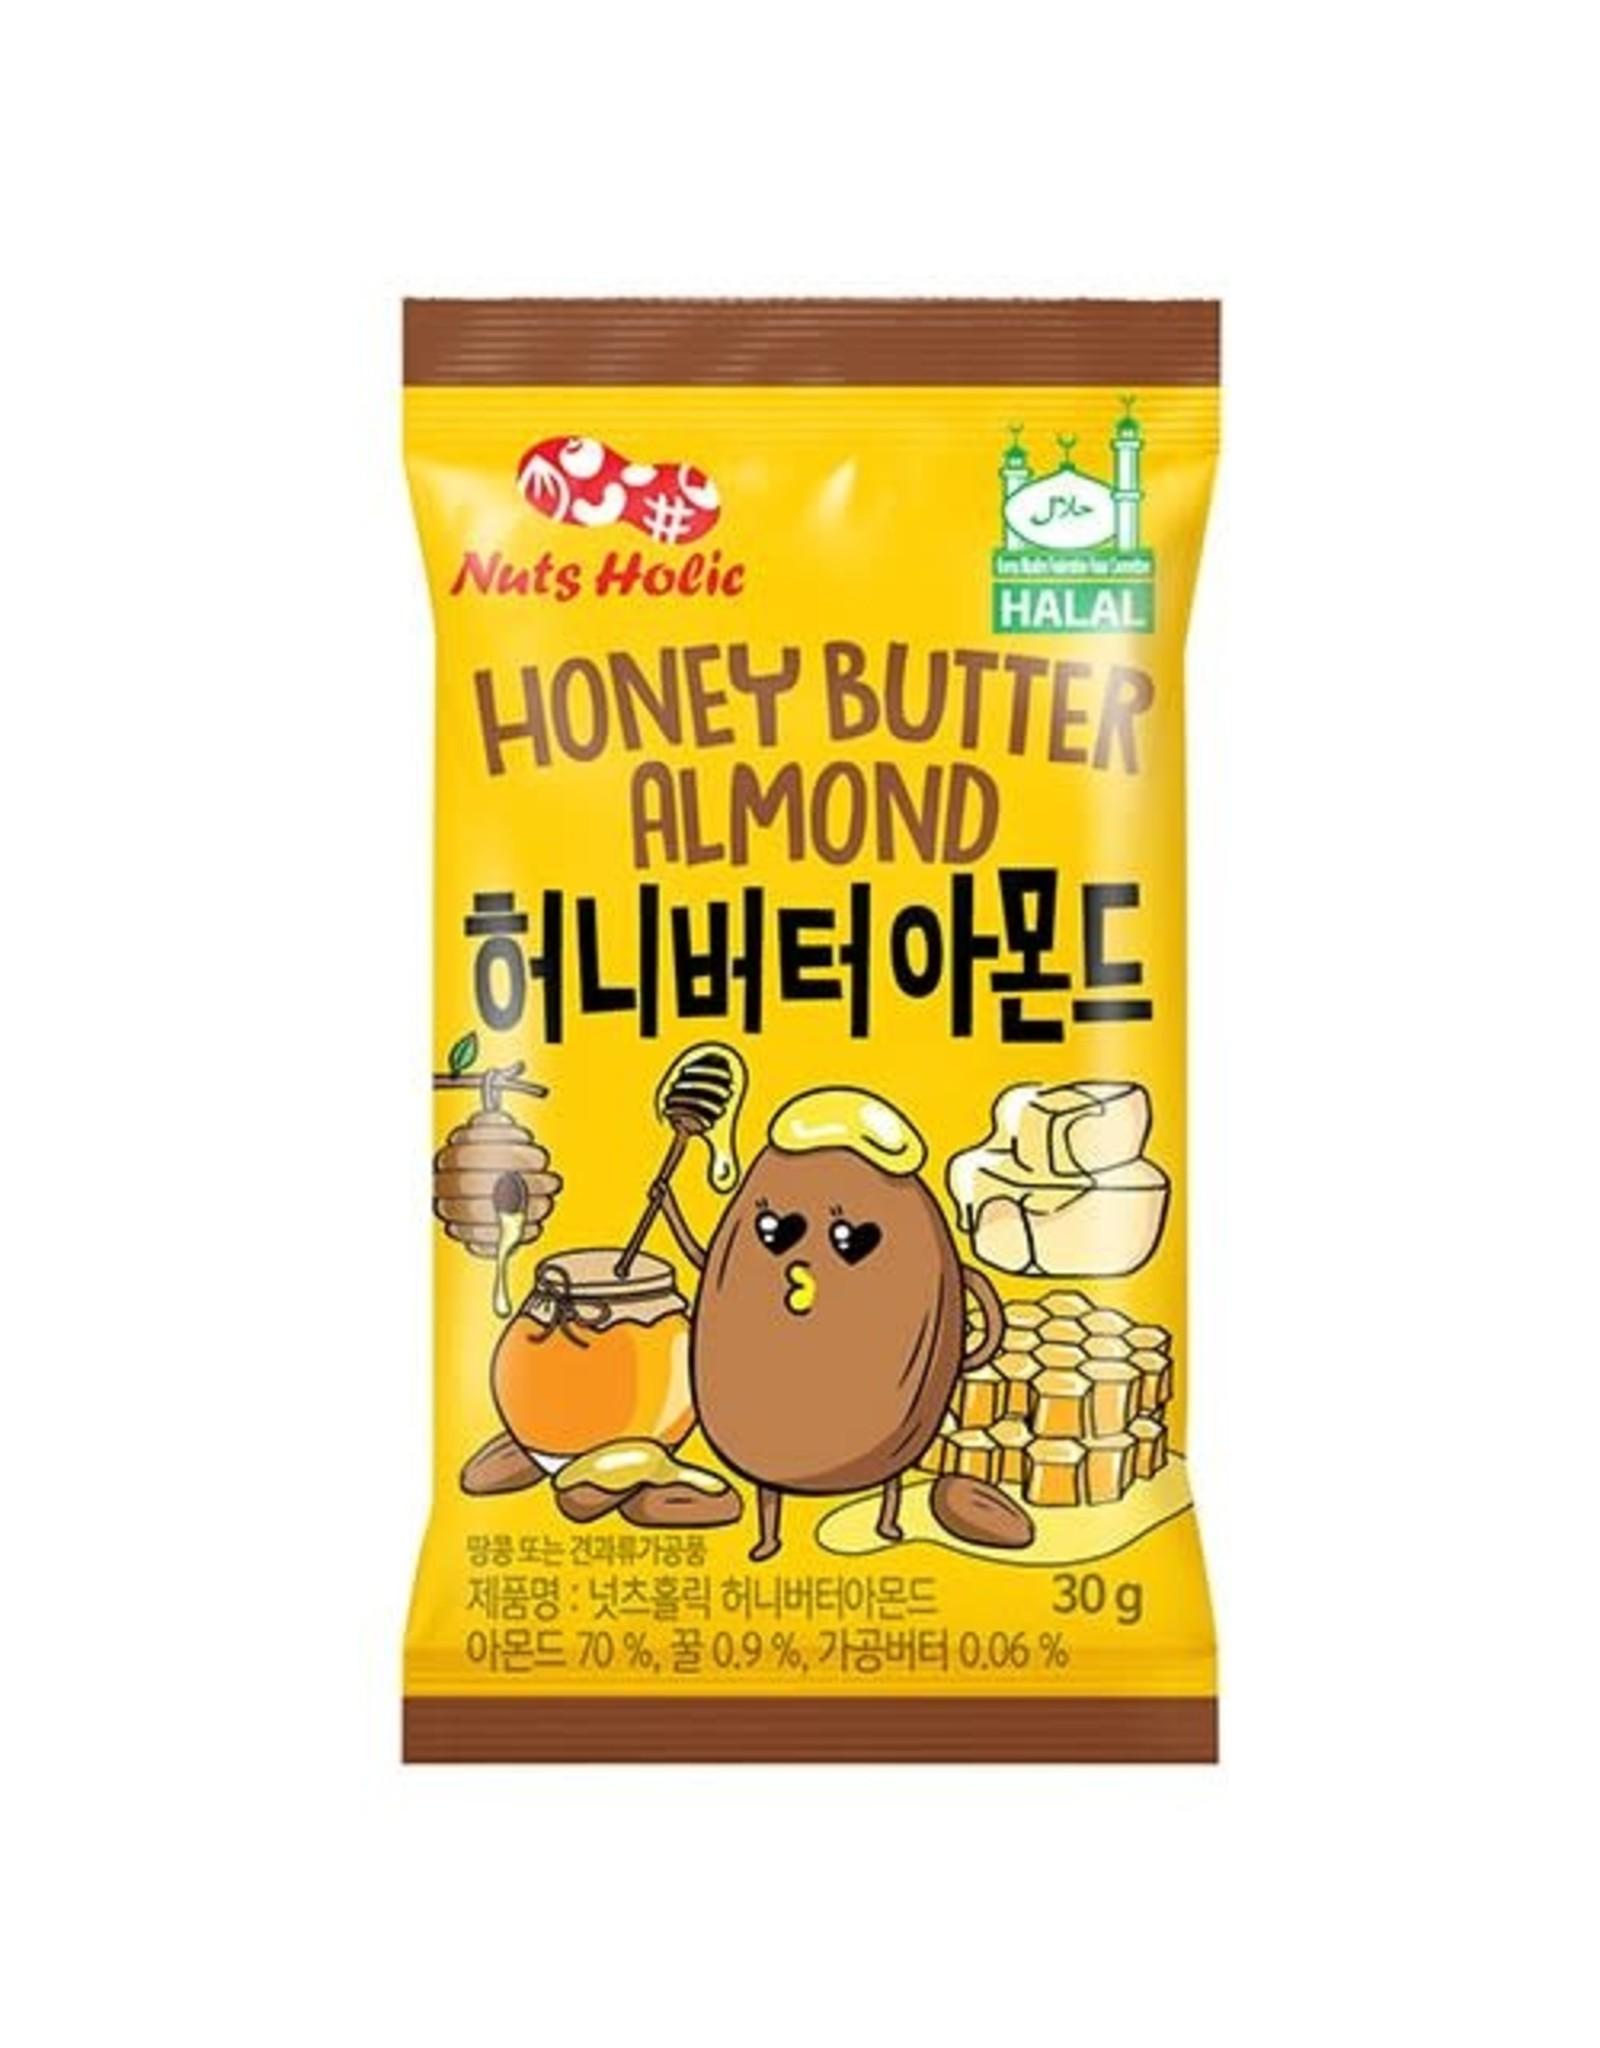 NutsHolic - Honey Butter Almonds - 30g